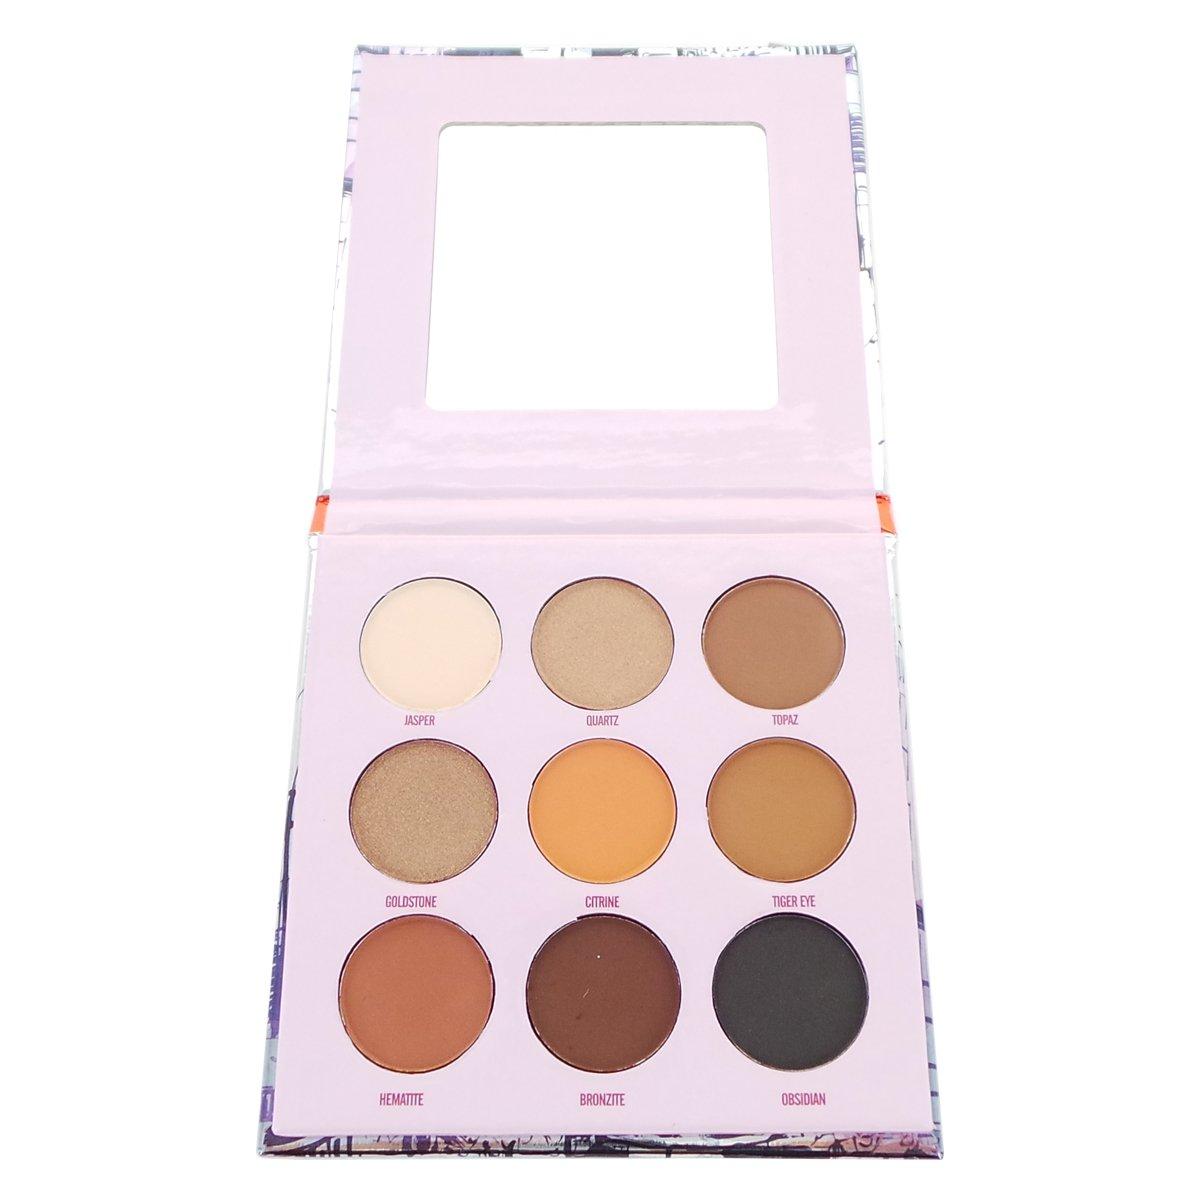 OKALAN Fancy Eyeshadow Pressed Powder – The Bronze Palette